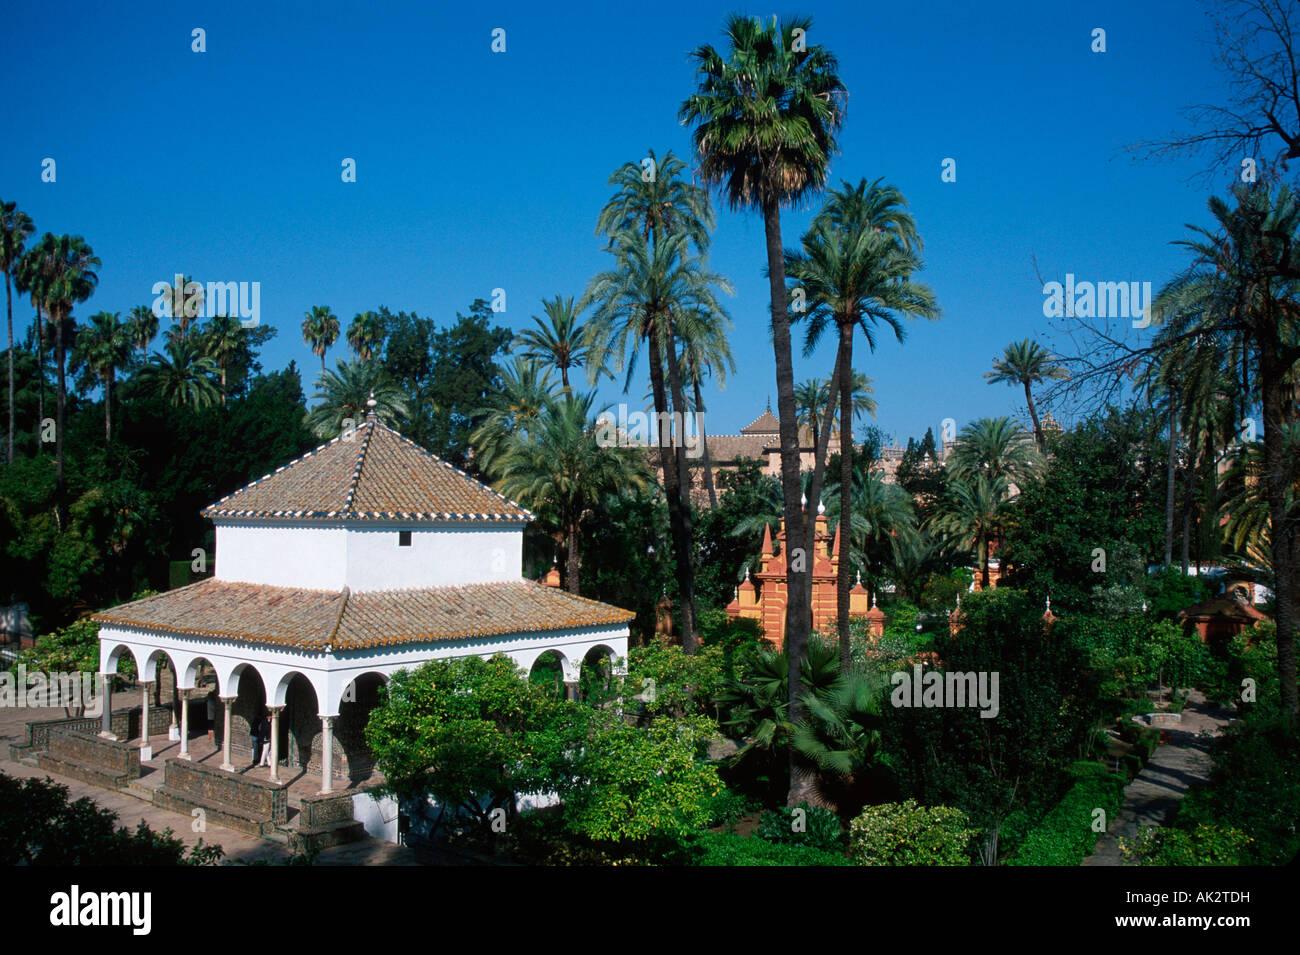 Arabian garden sevilla stock photo royalty free image - Garden center sevilla ...